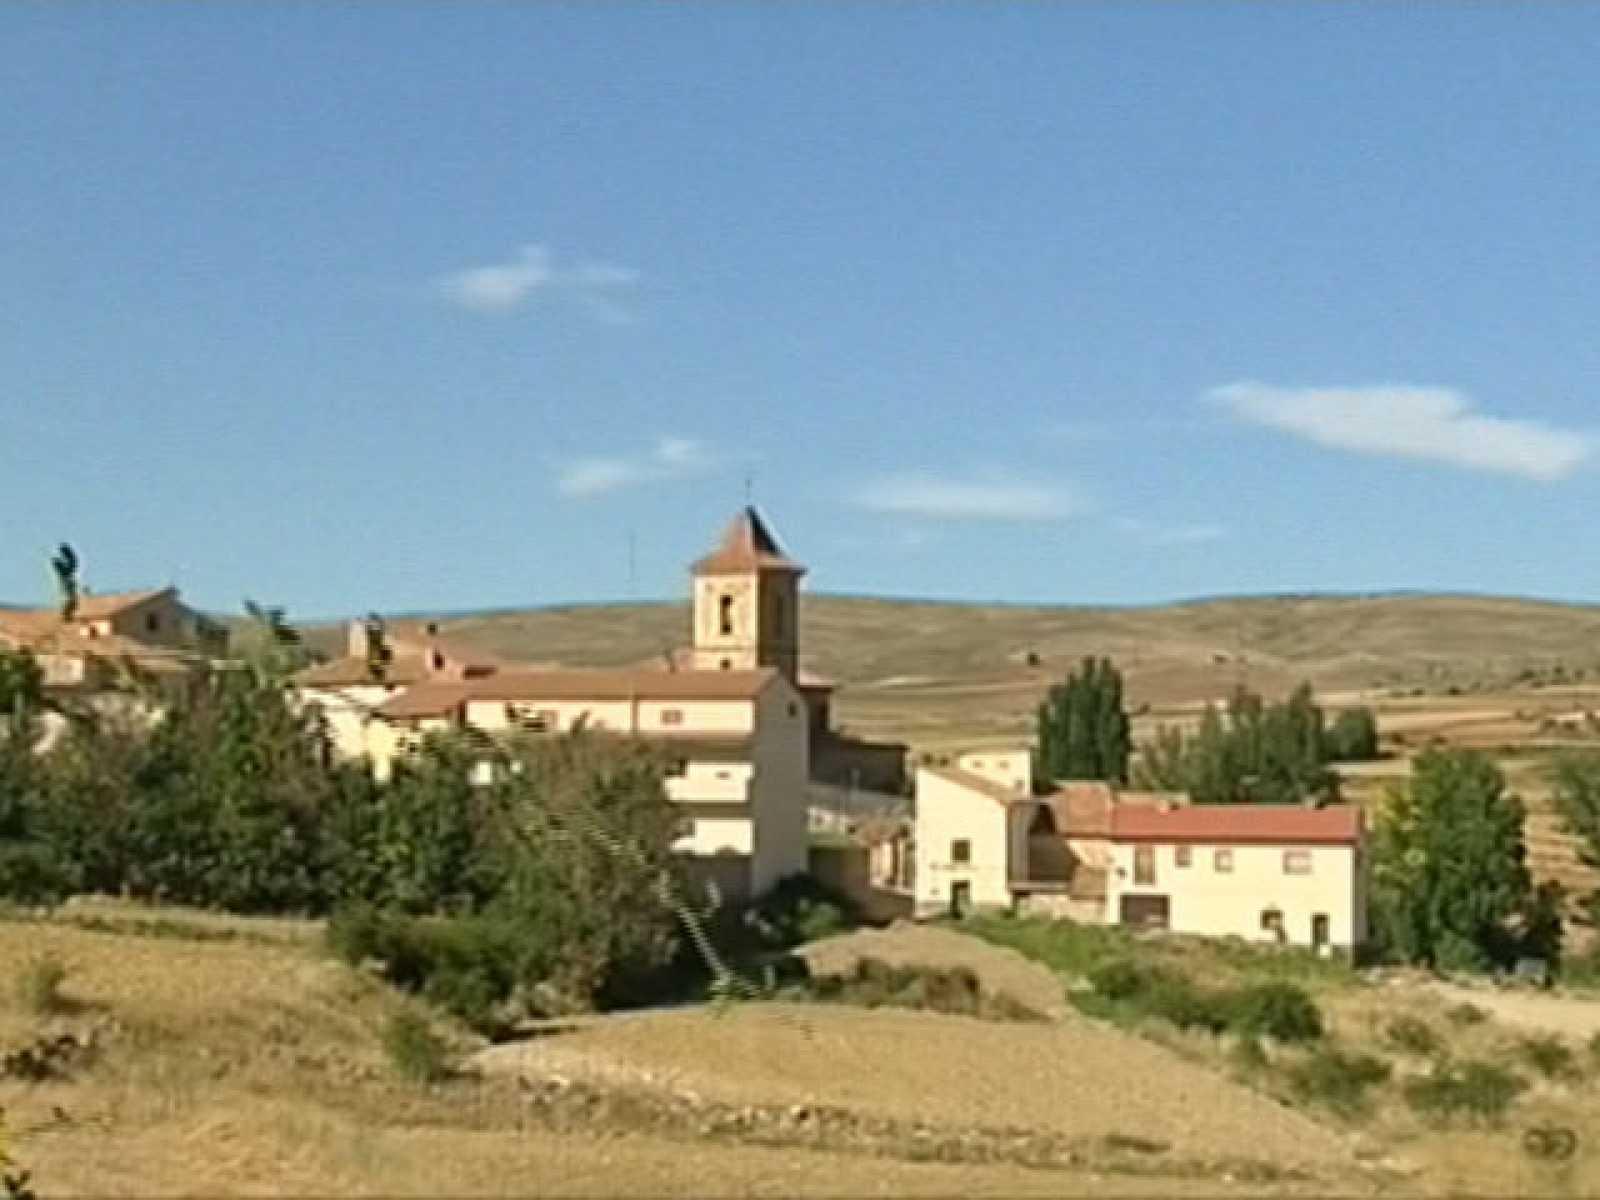 Reportajes Emisoras - Teruel - La Covid repuebla - 29/12/20 - Escuchar ahora